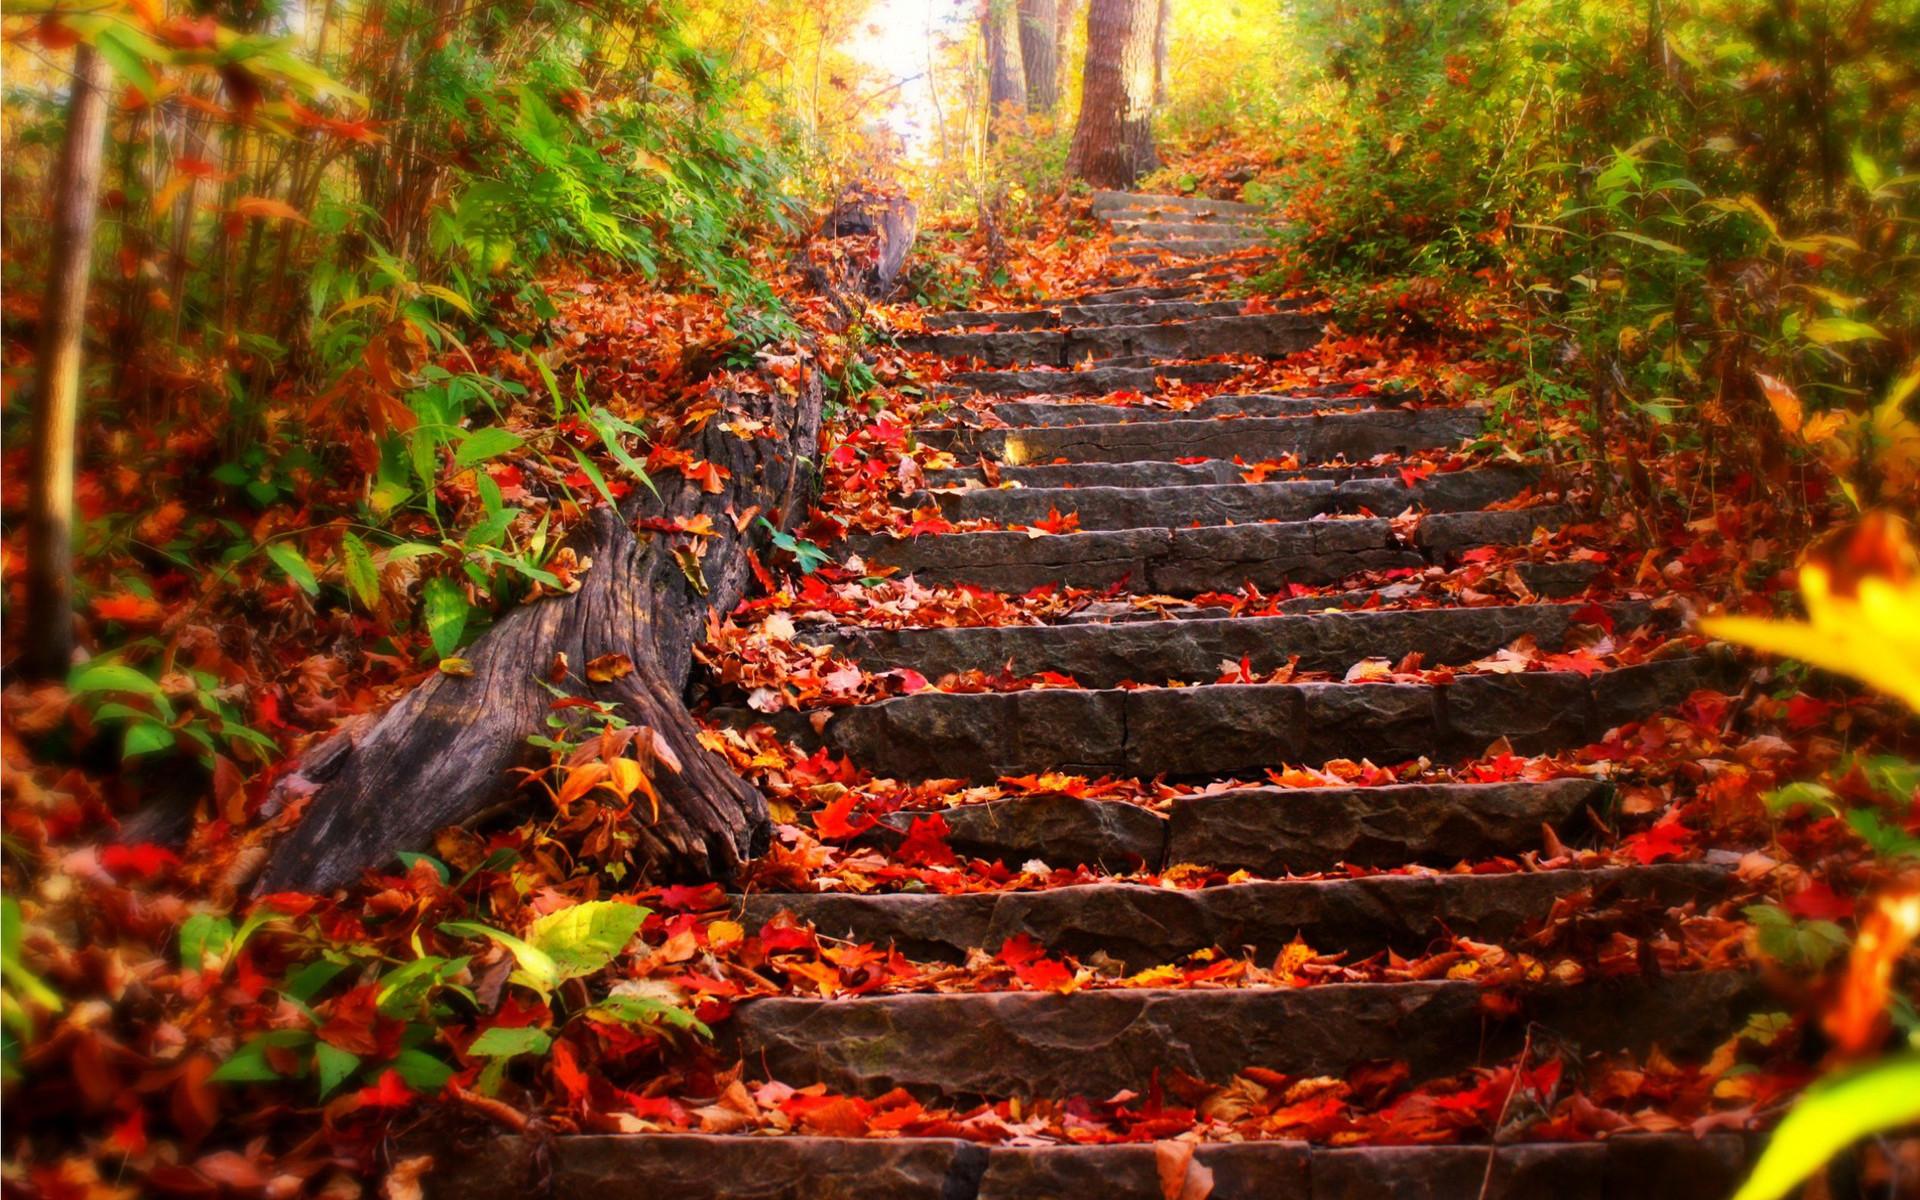 Fall Desktop Wallpaper Autumn Leaves